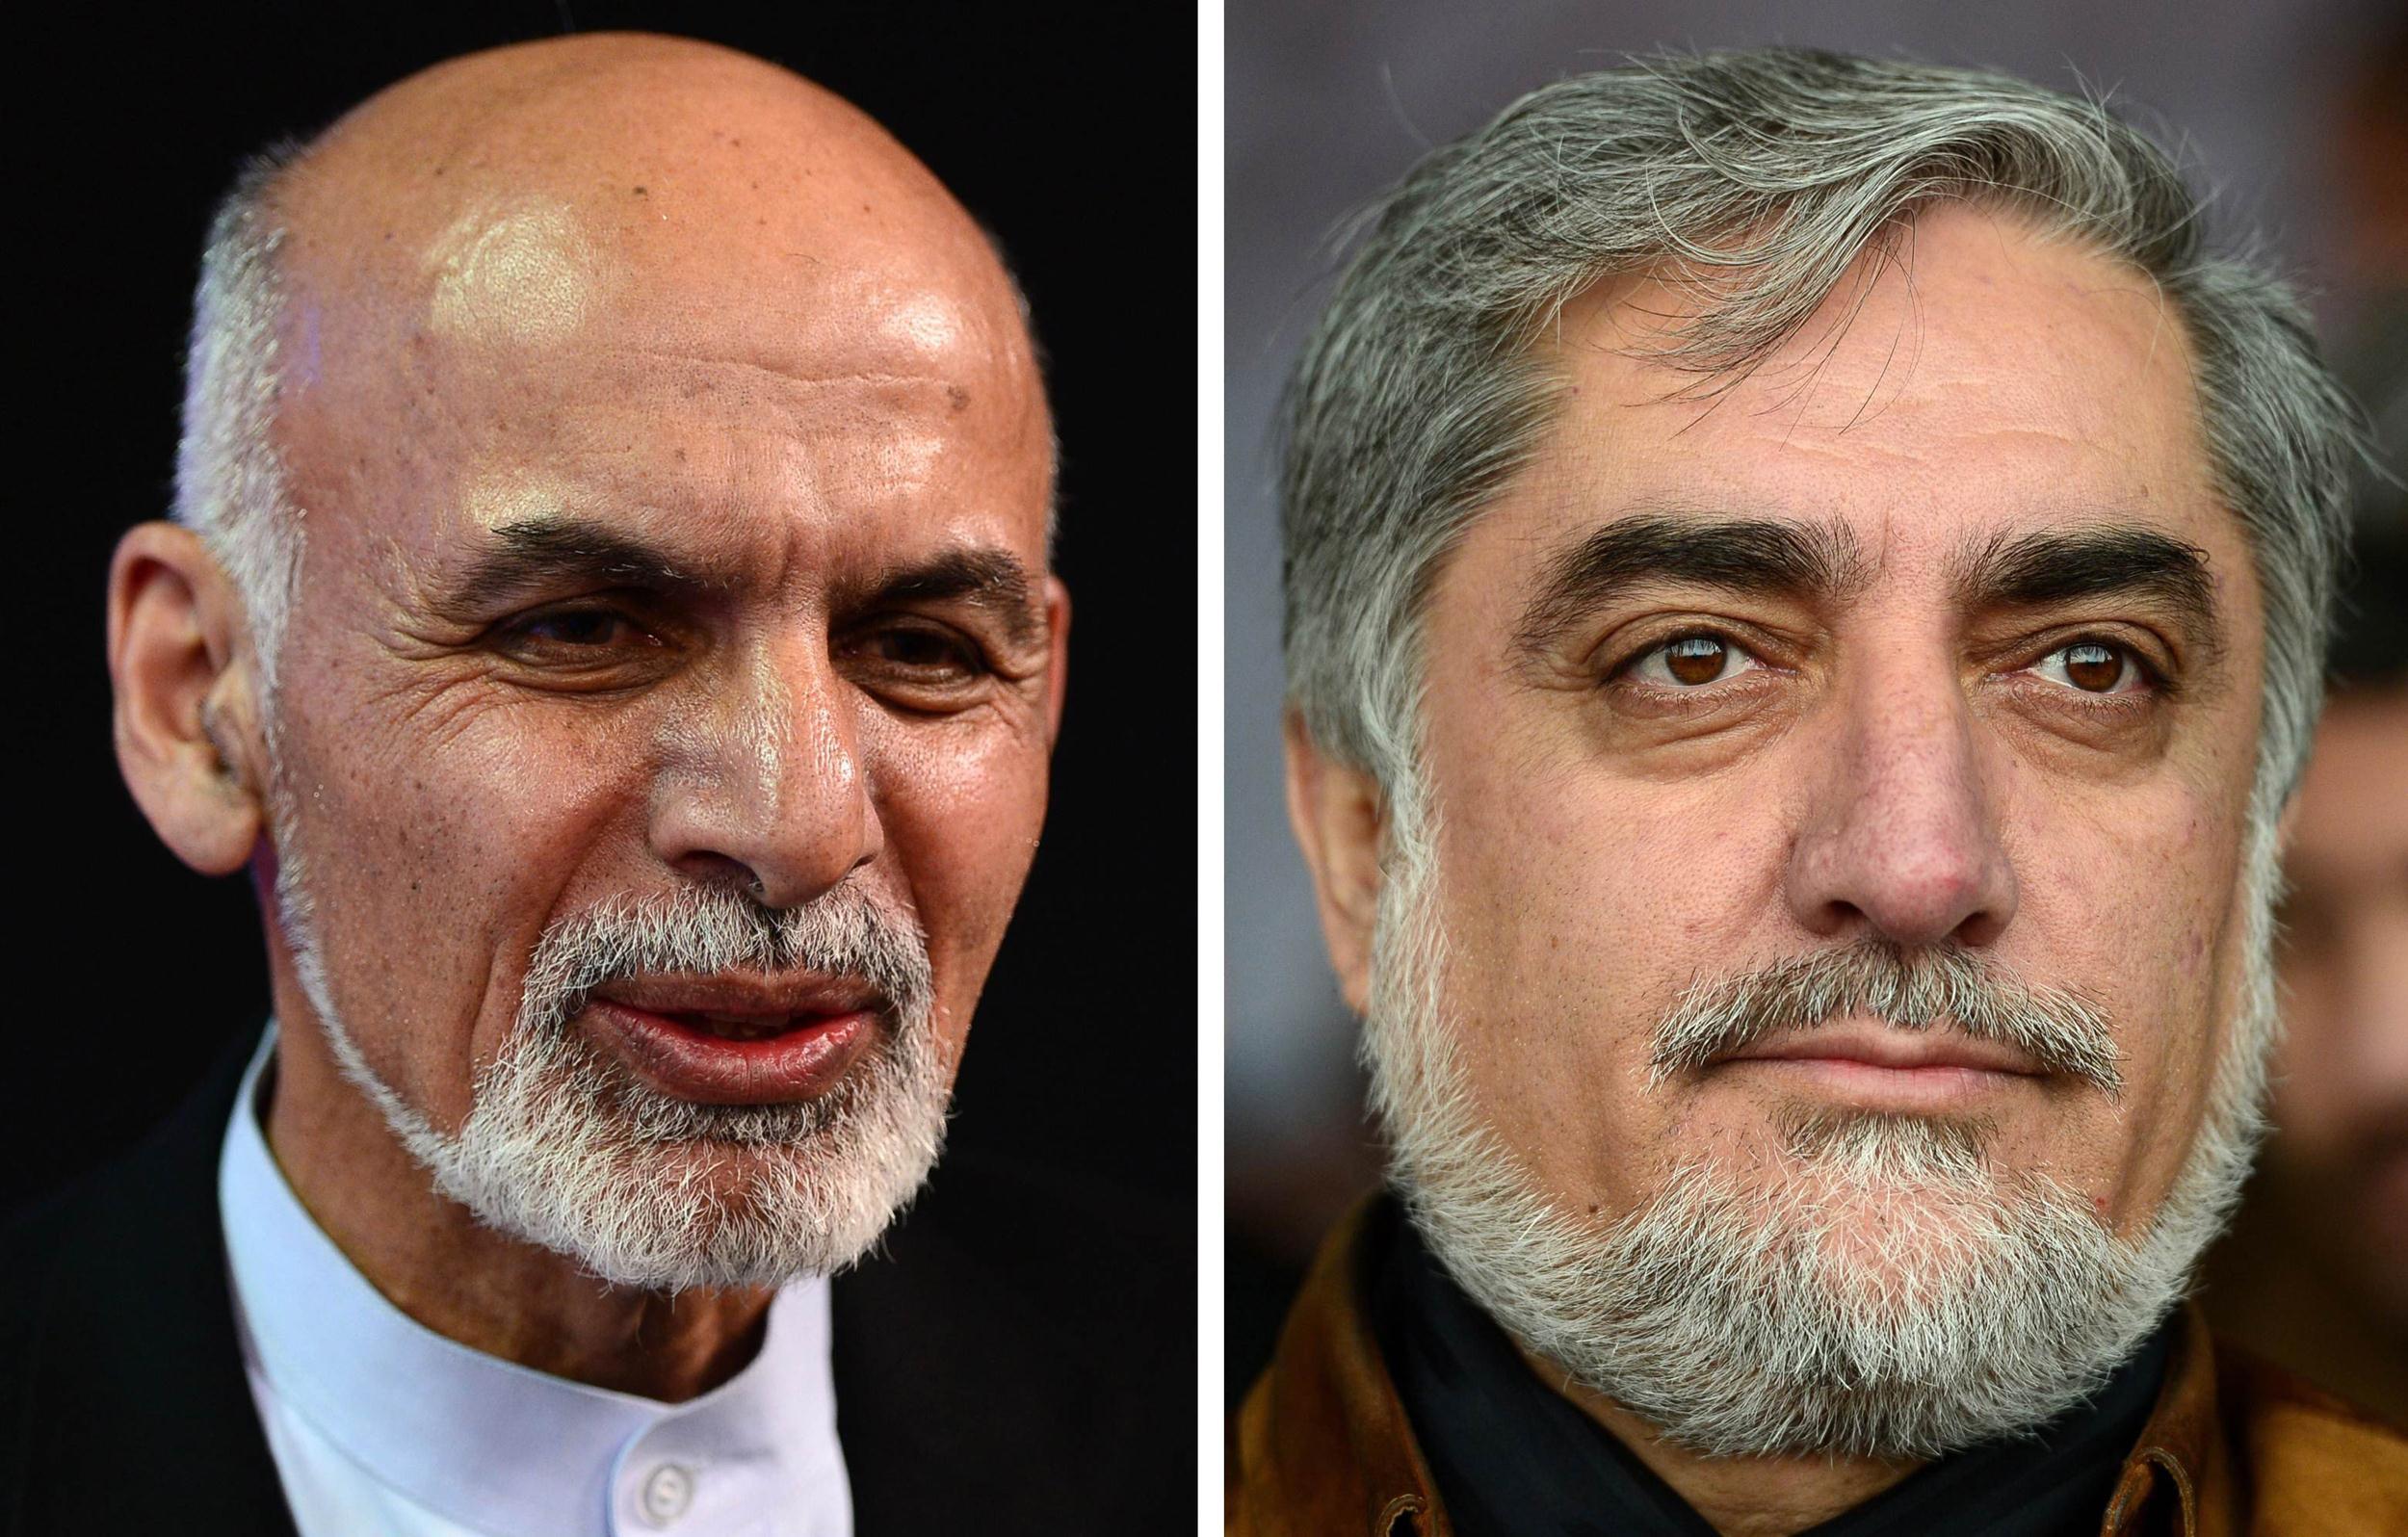 140426-afghan-election-mn-1116_e0ba57ba8dd2ed4ba52bef1c98dd6aaa